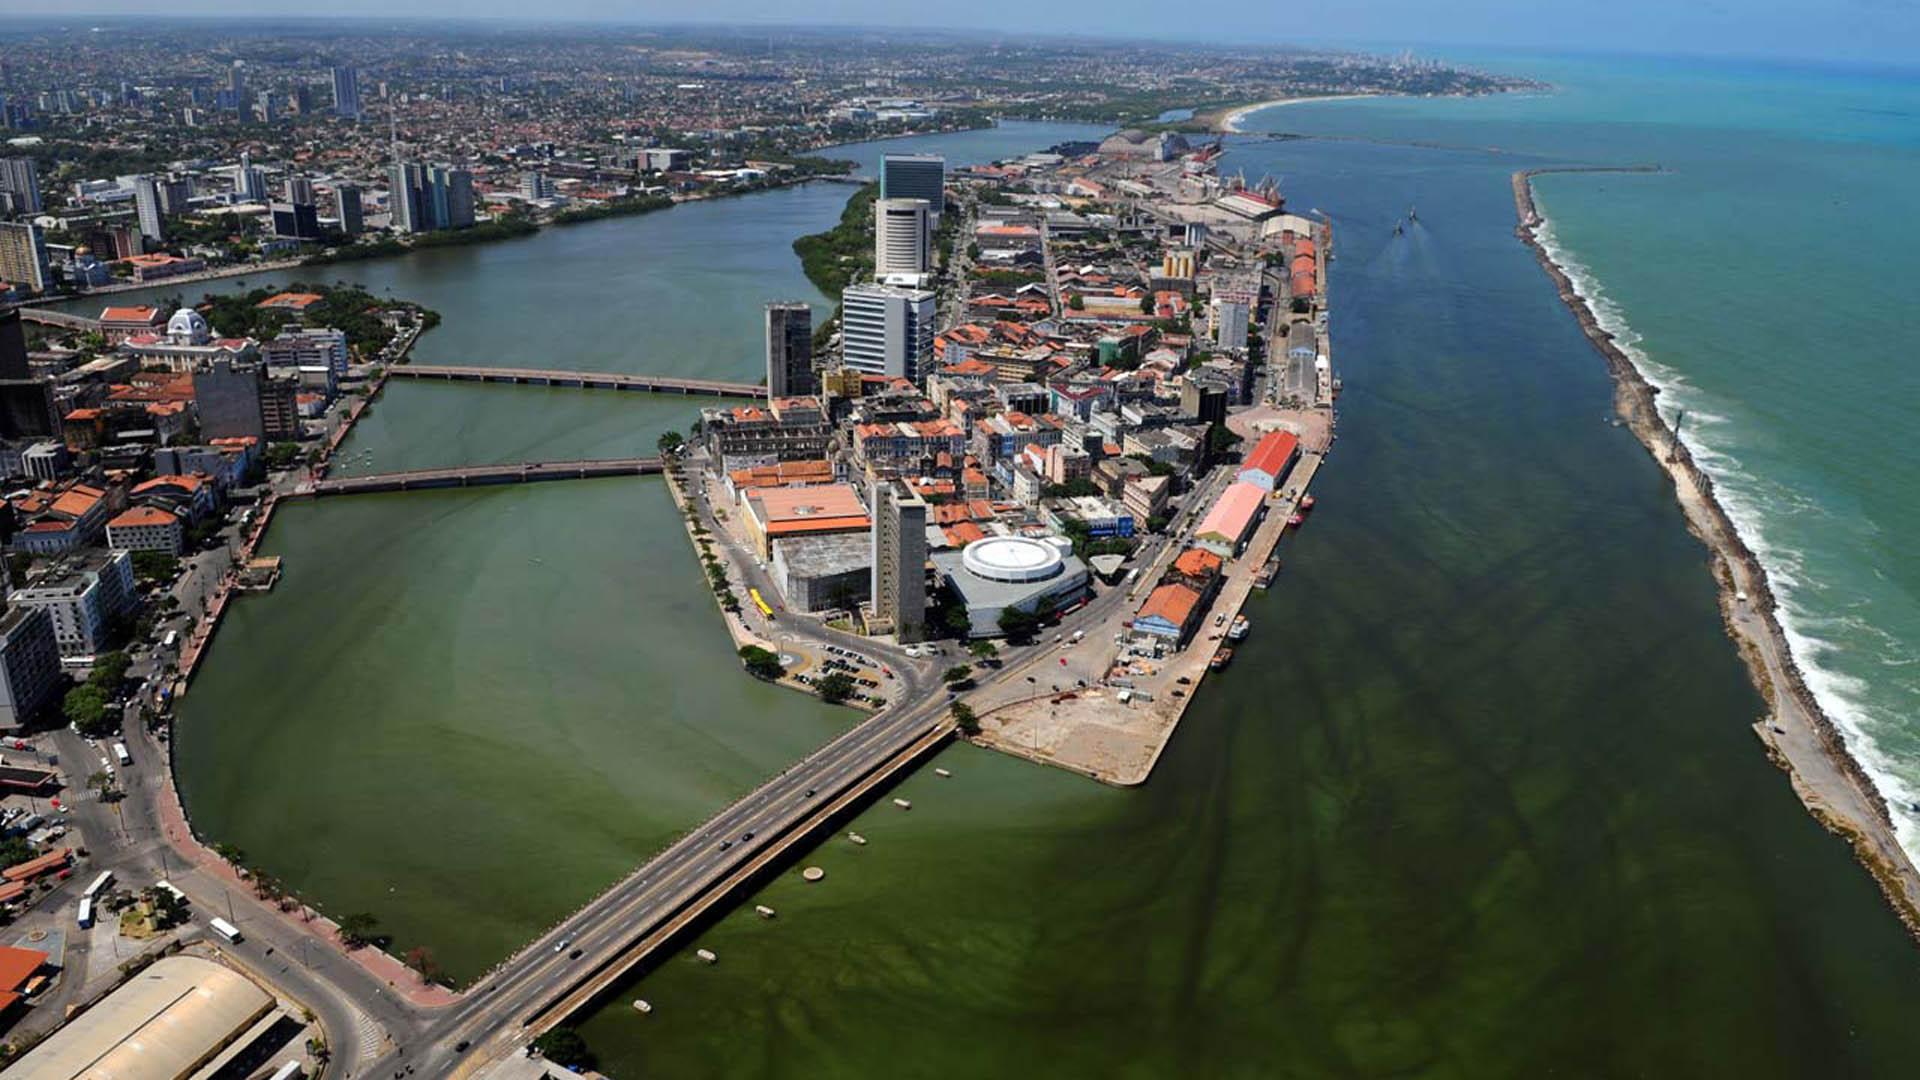 Wallpaper Decor Recife : Recife and olinda brazil matuet?